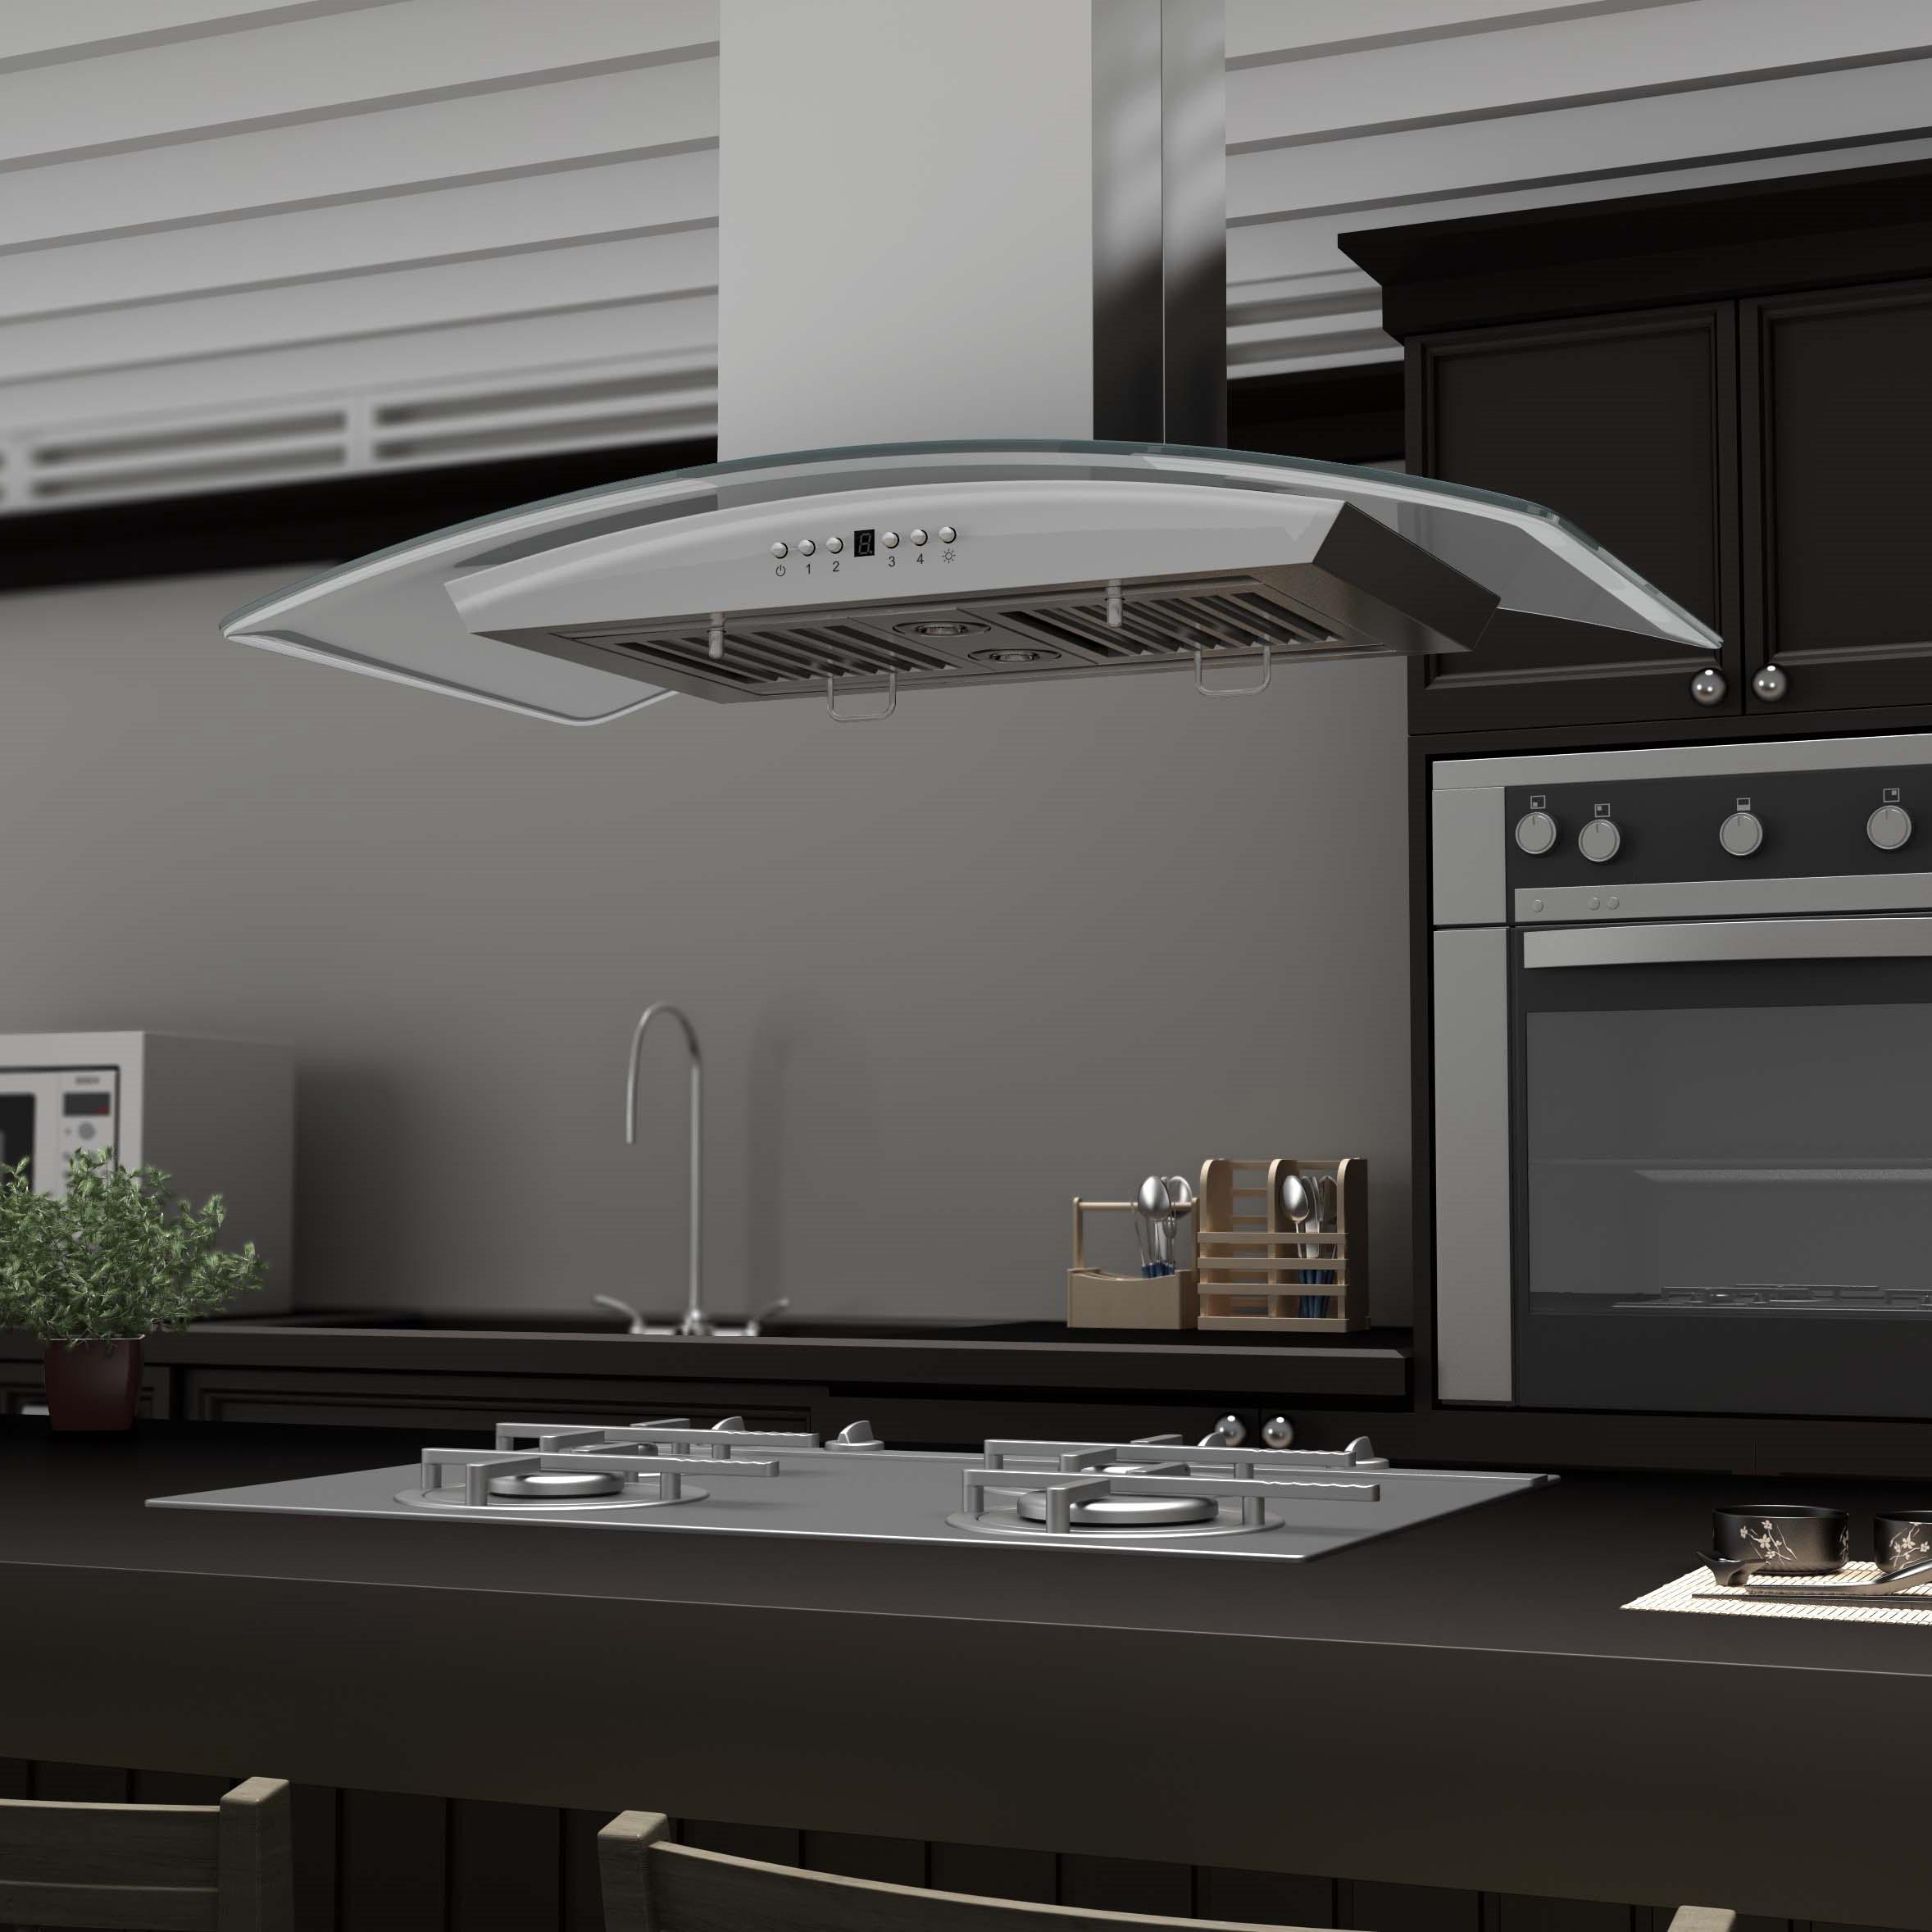 zline-stainless-steel-island-range-hood-Gl5i-kitchen-close.jpg